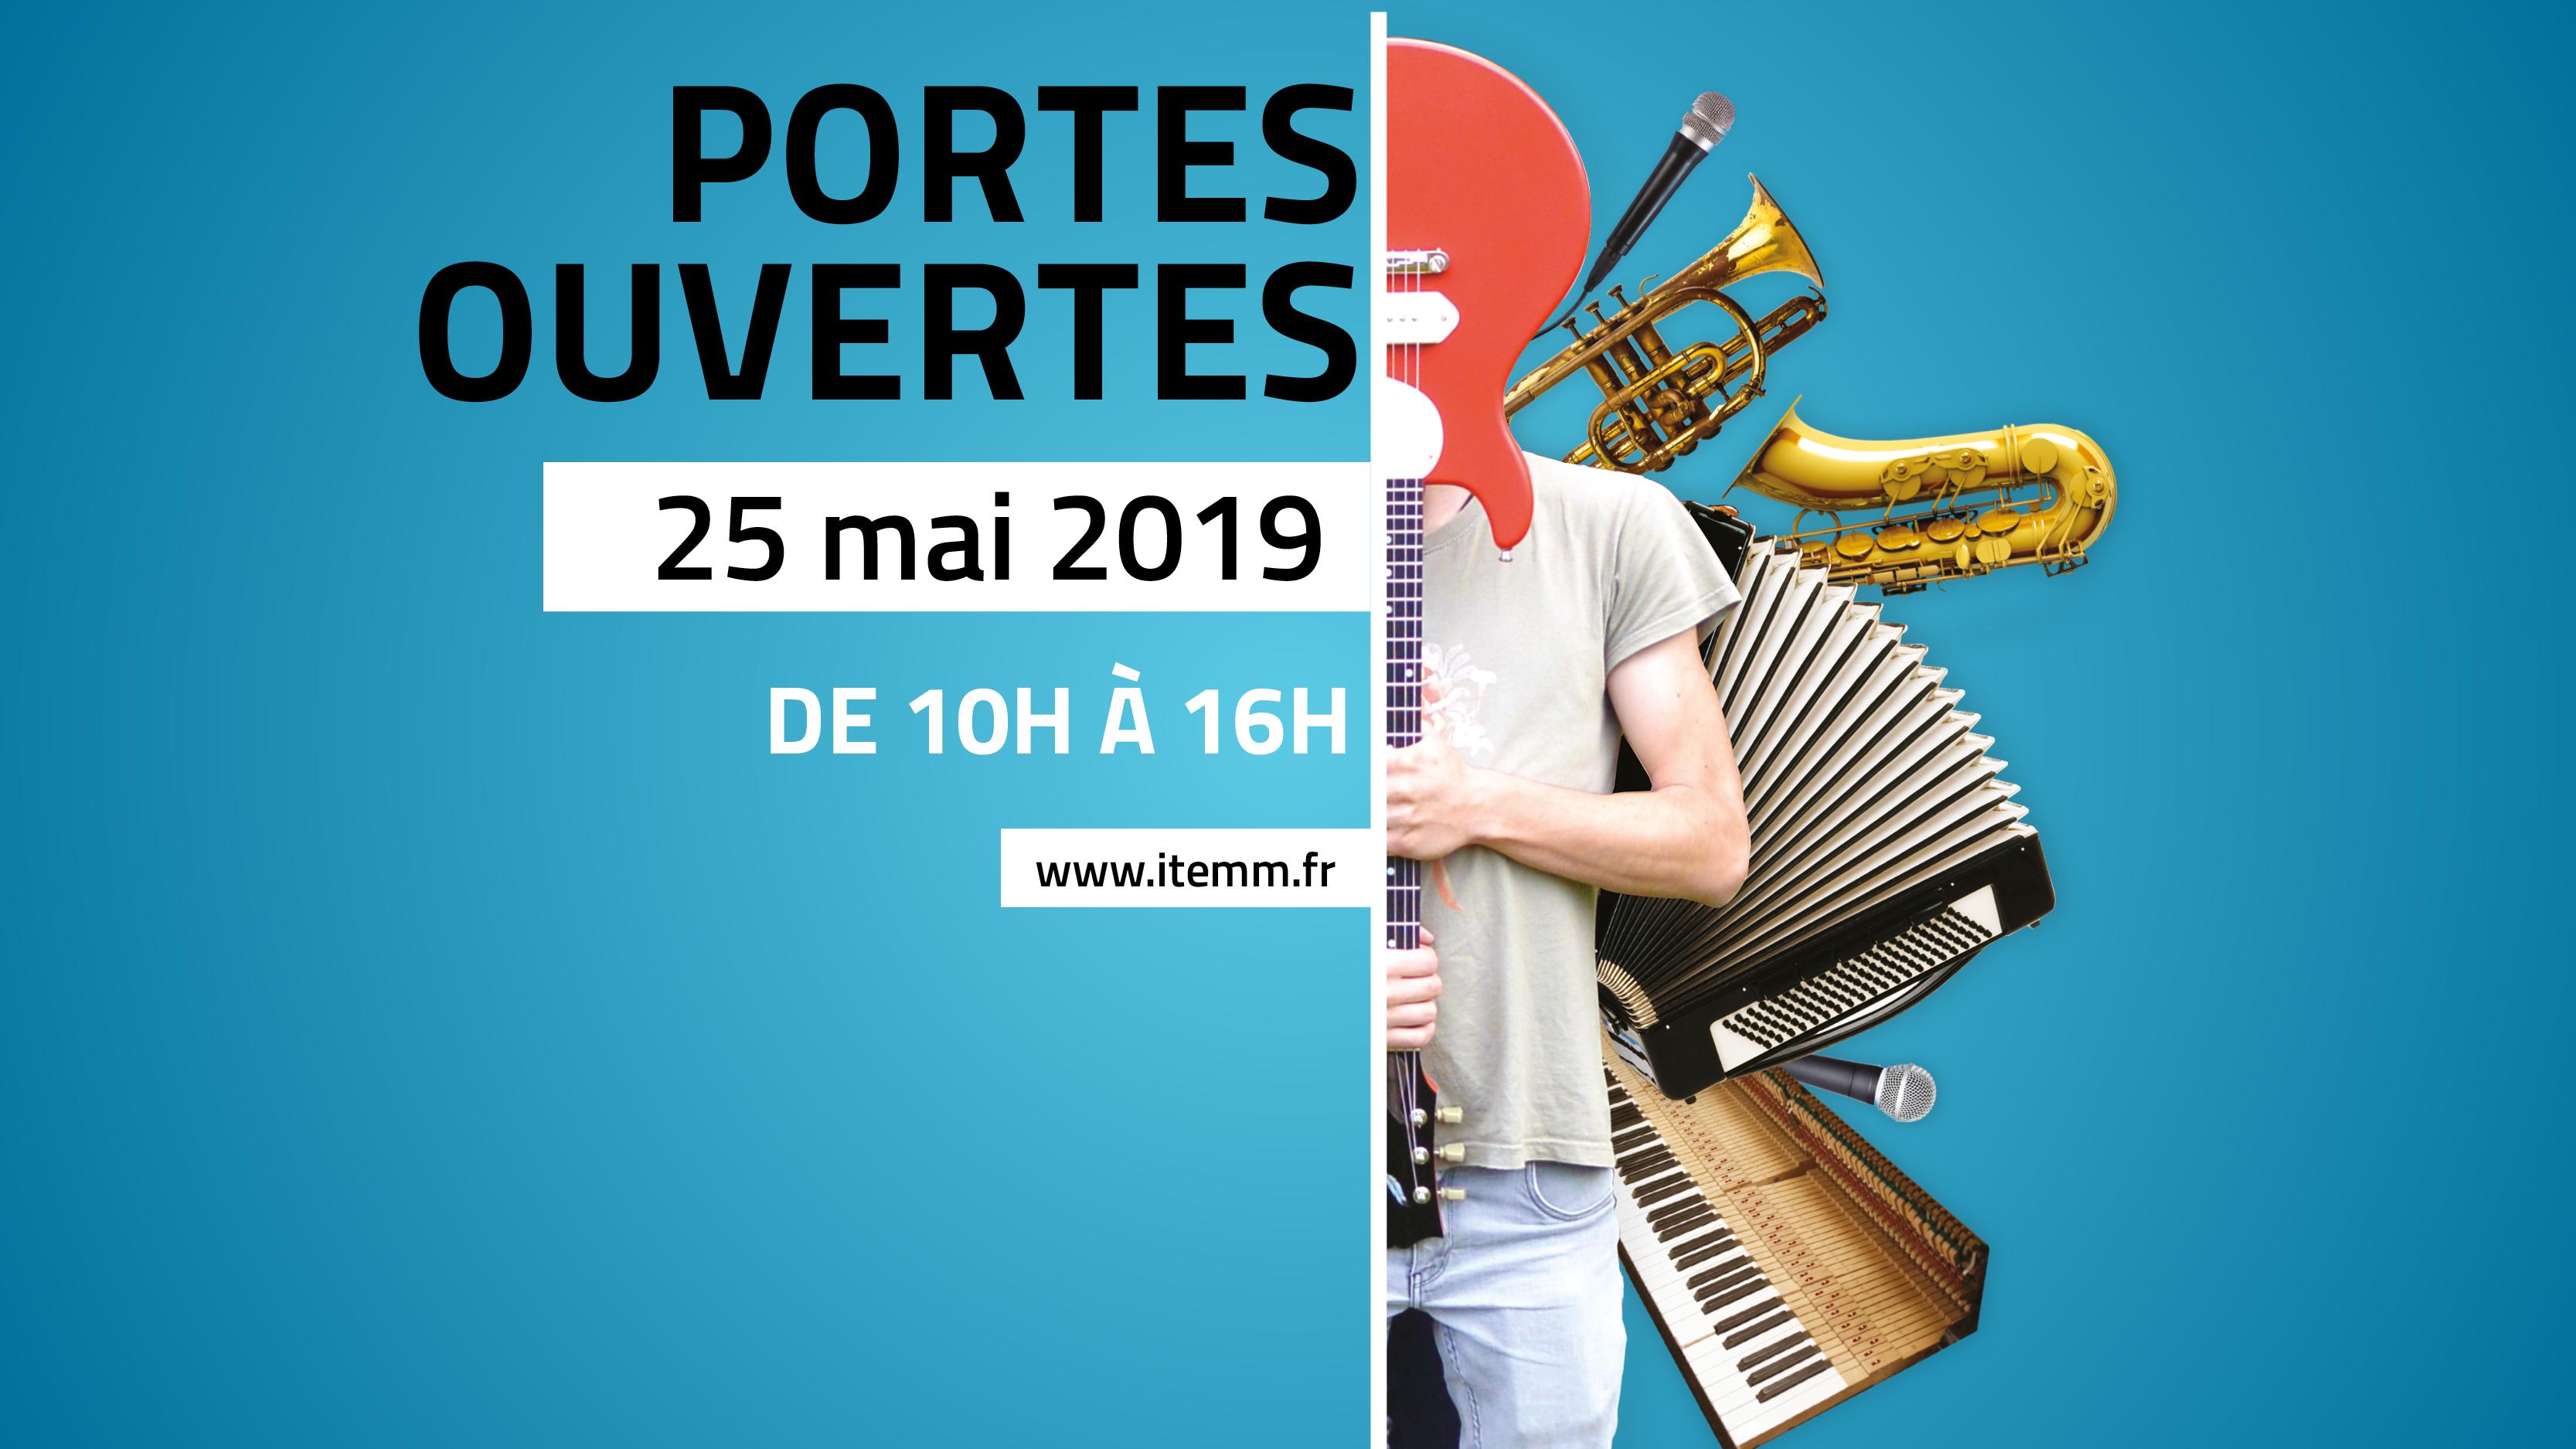 Portes ouvertes de l'ITEMM : Samedi 25 mai 2019